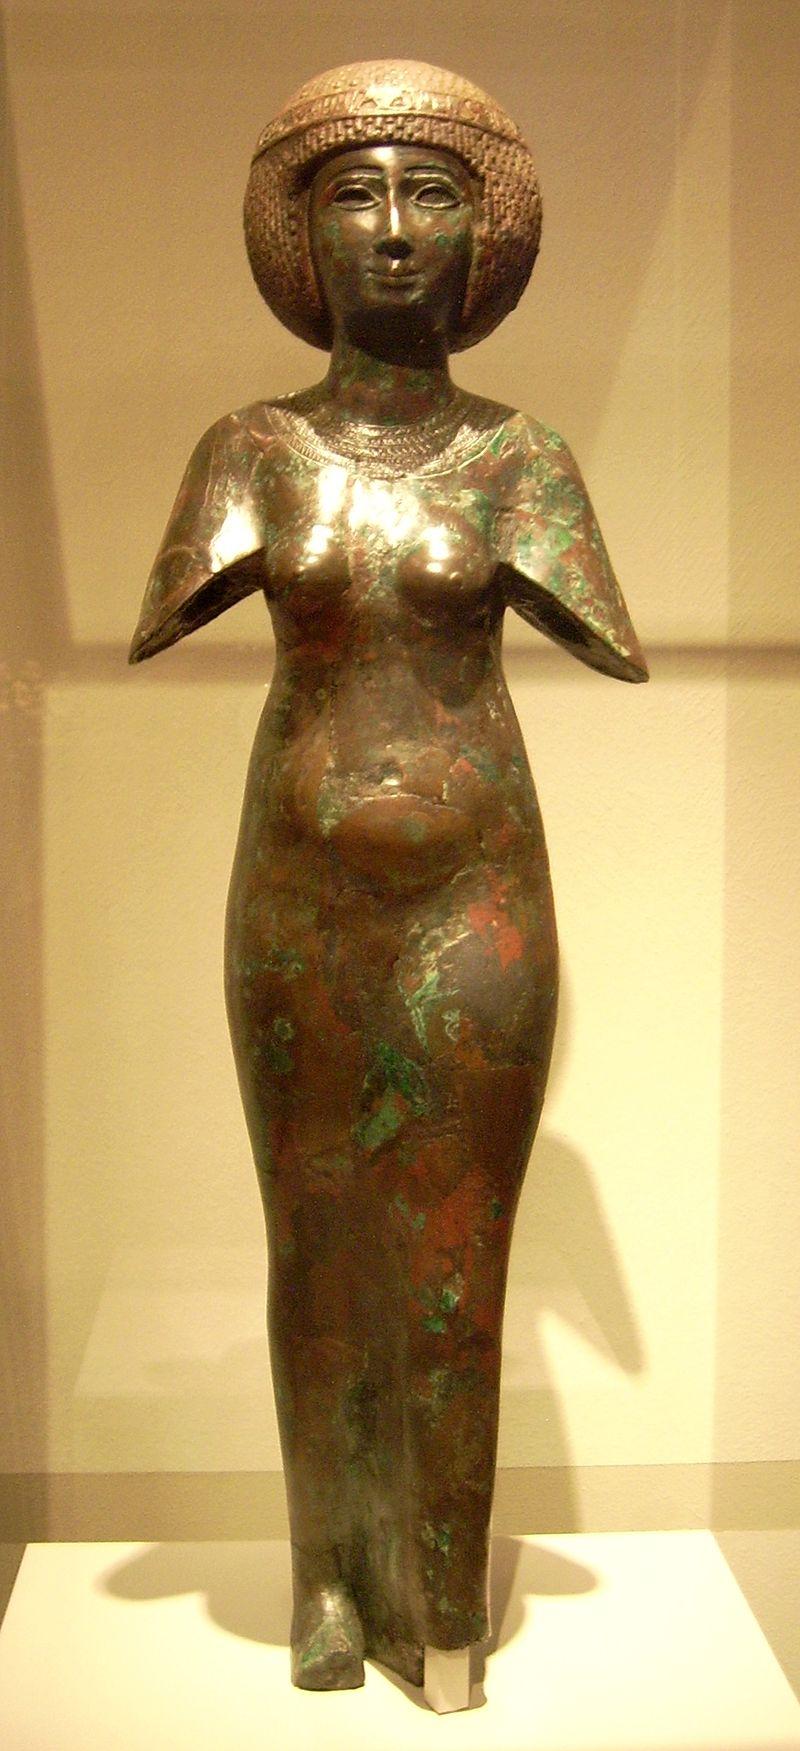 Museo de Berlin 800px-Figurine_of_Meres-Amun_at_%C3%84gyptisches_Museum_Berlin